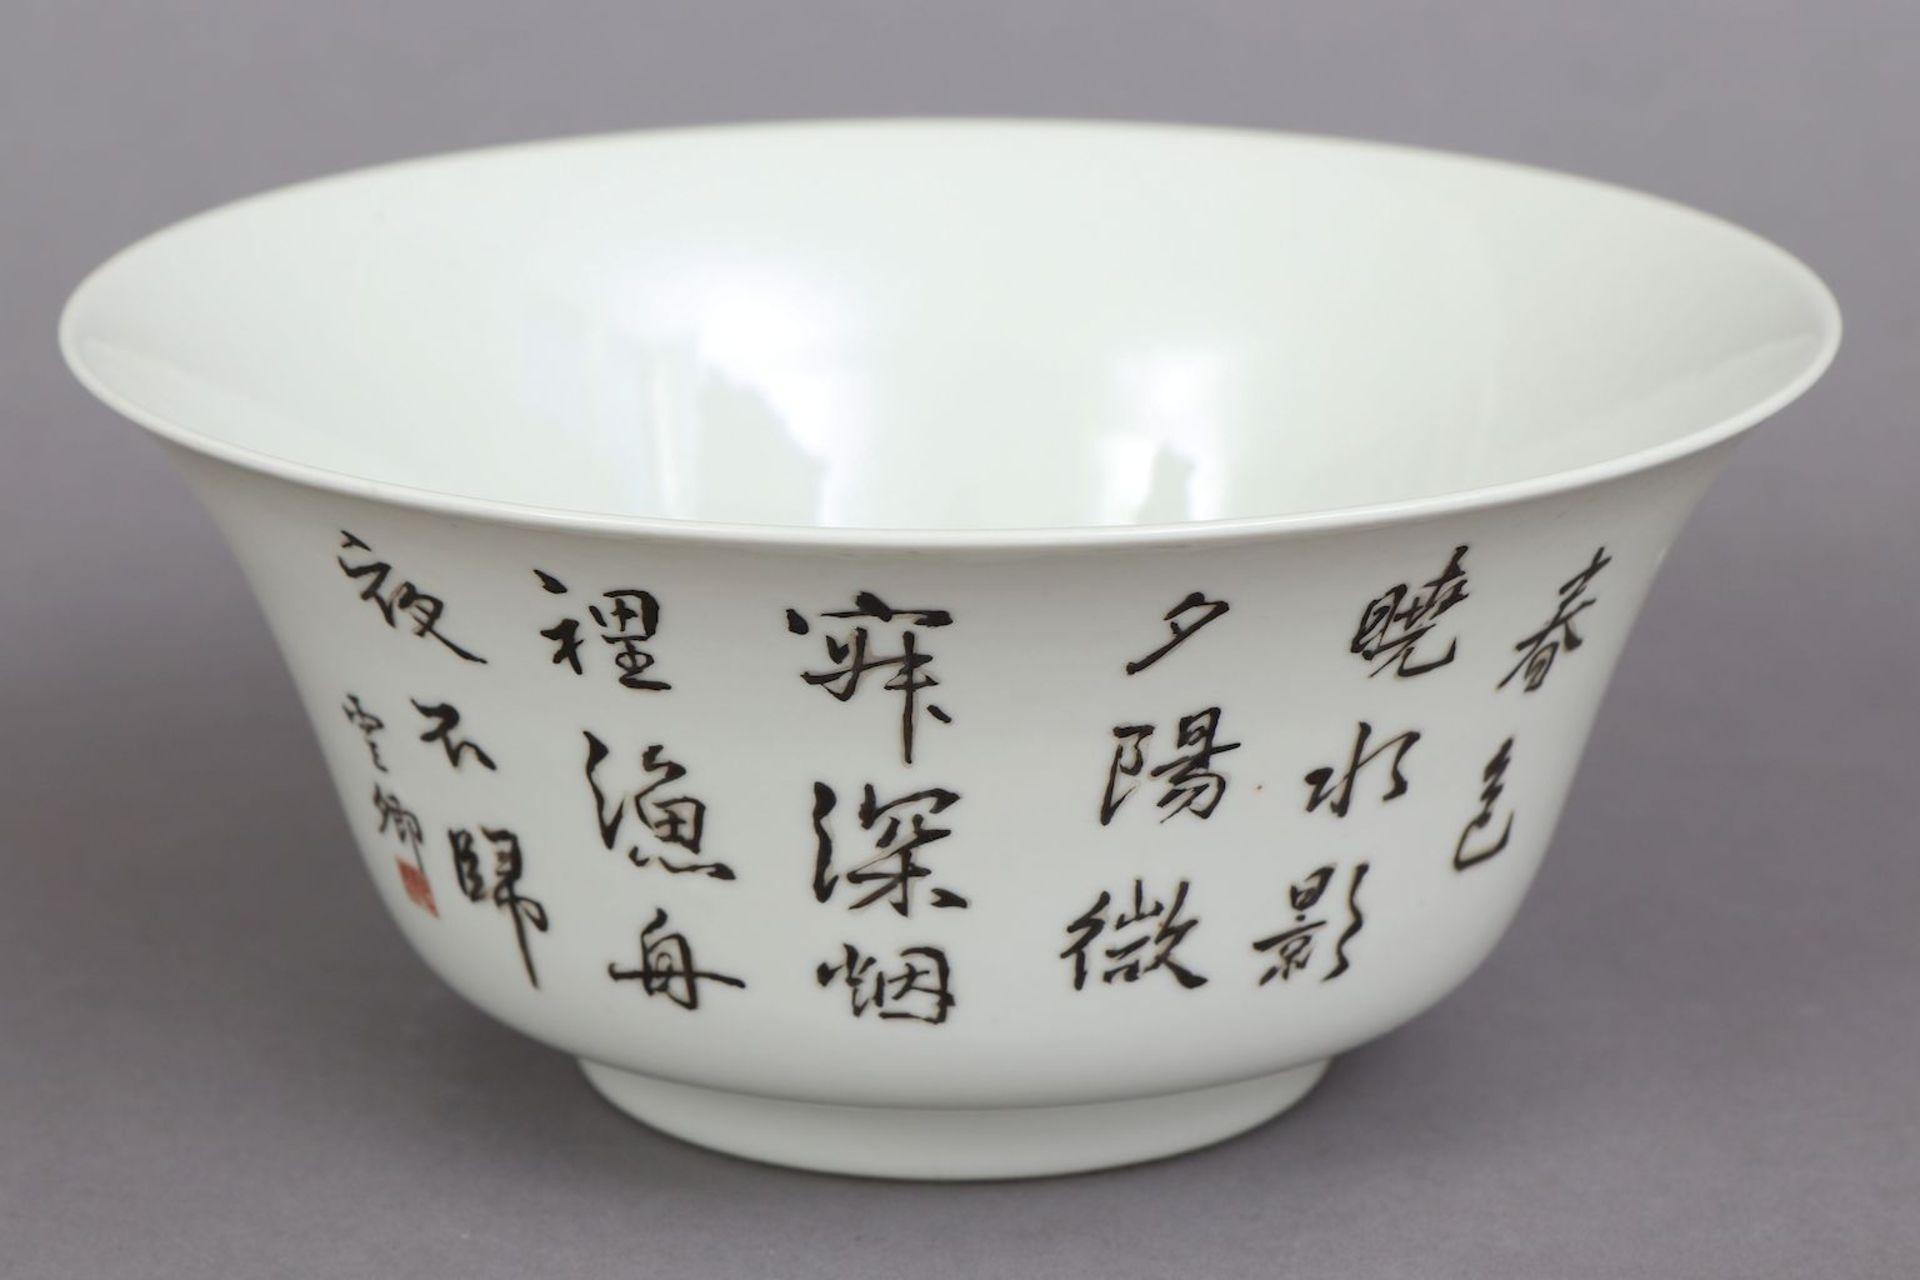 Chinesische Porzellanschale/Kuppa - Image 2 of 4